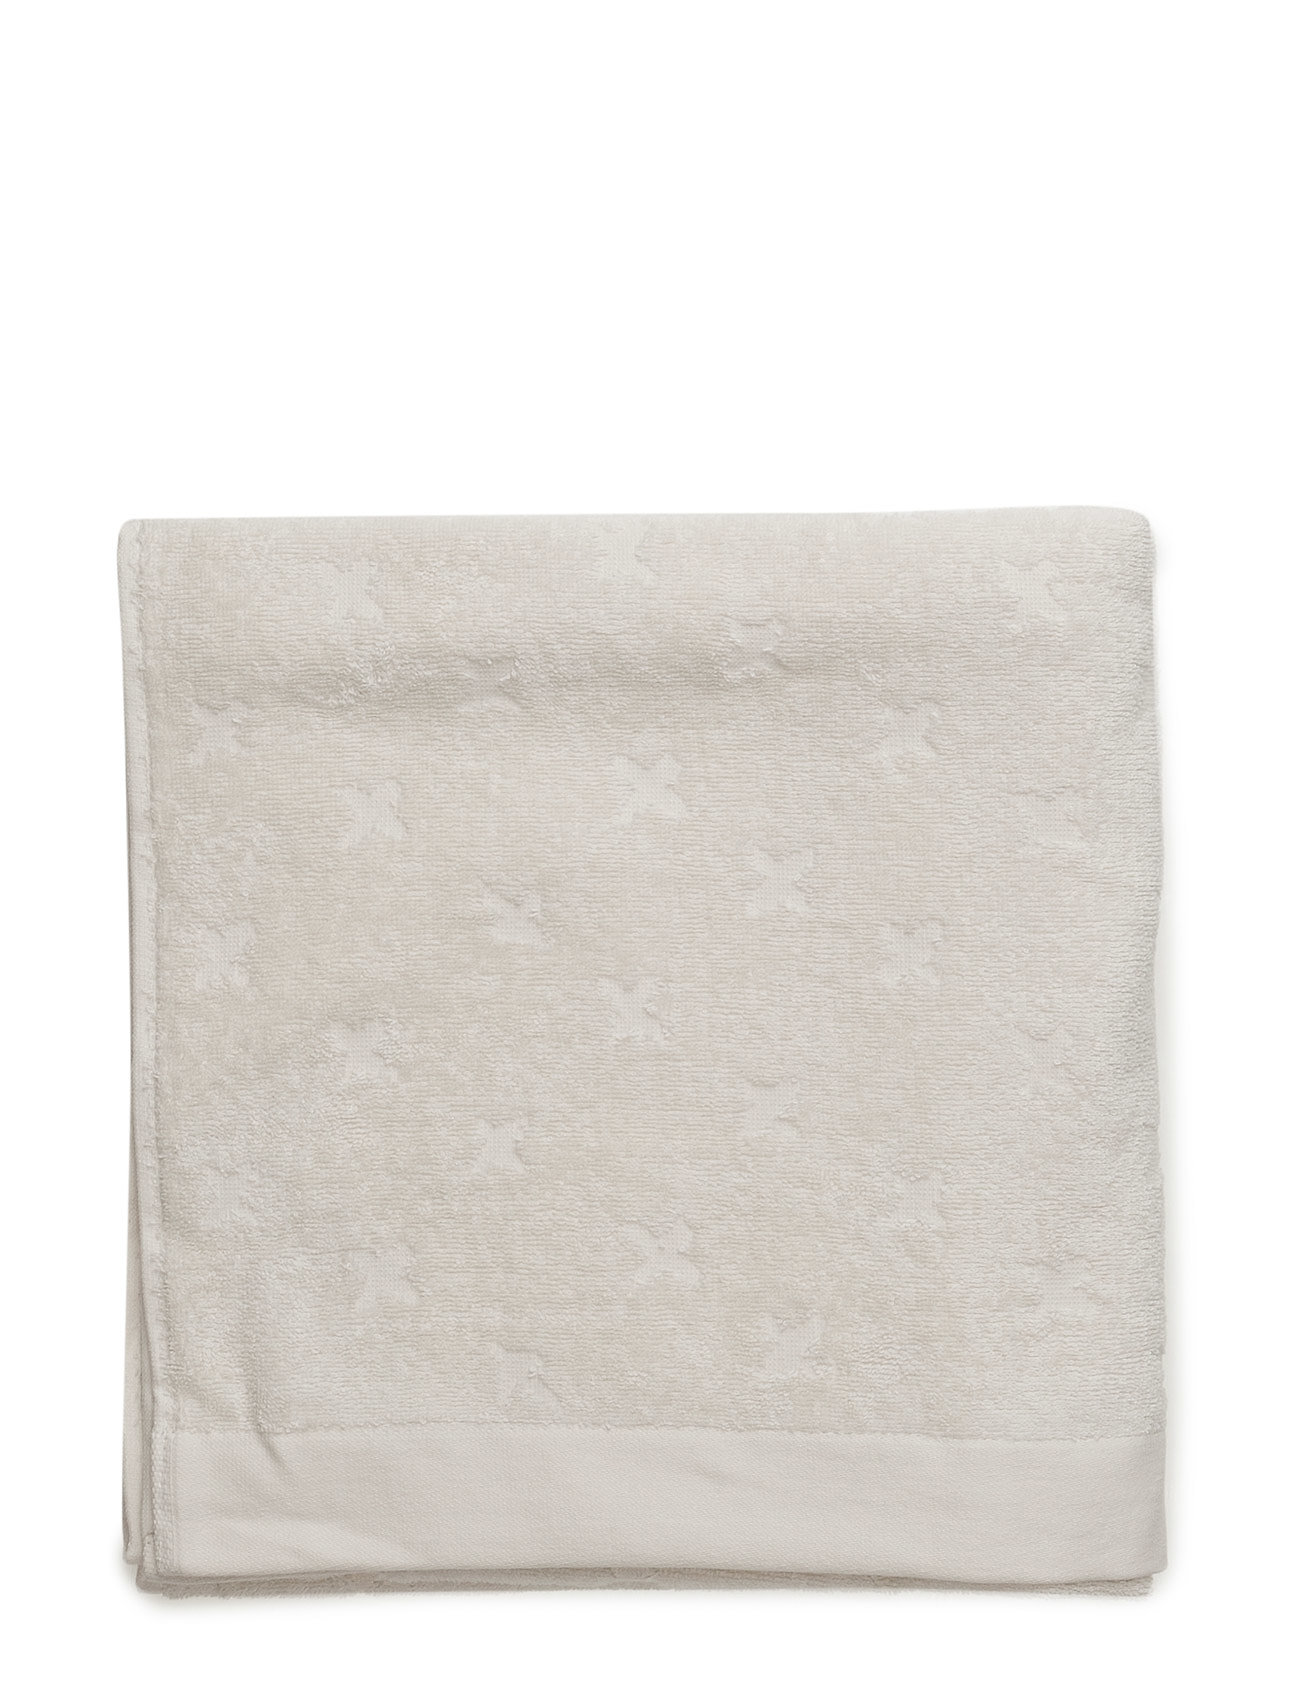 Müsli by Green Cotton Towel Bath - ECRU